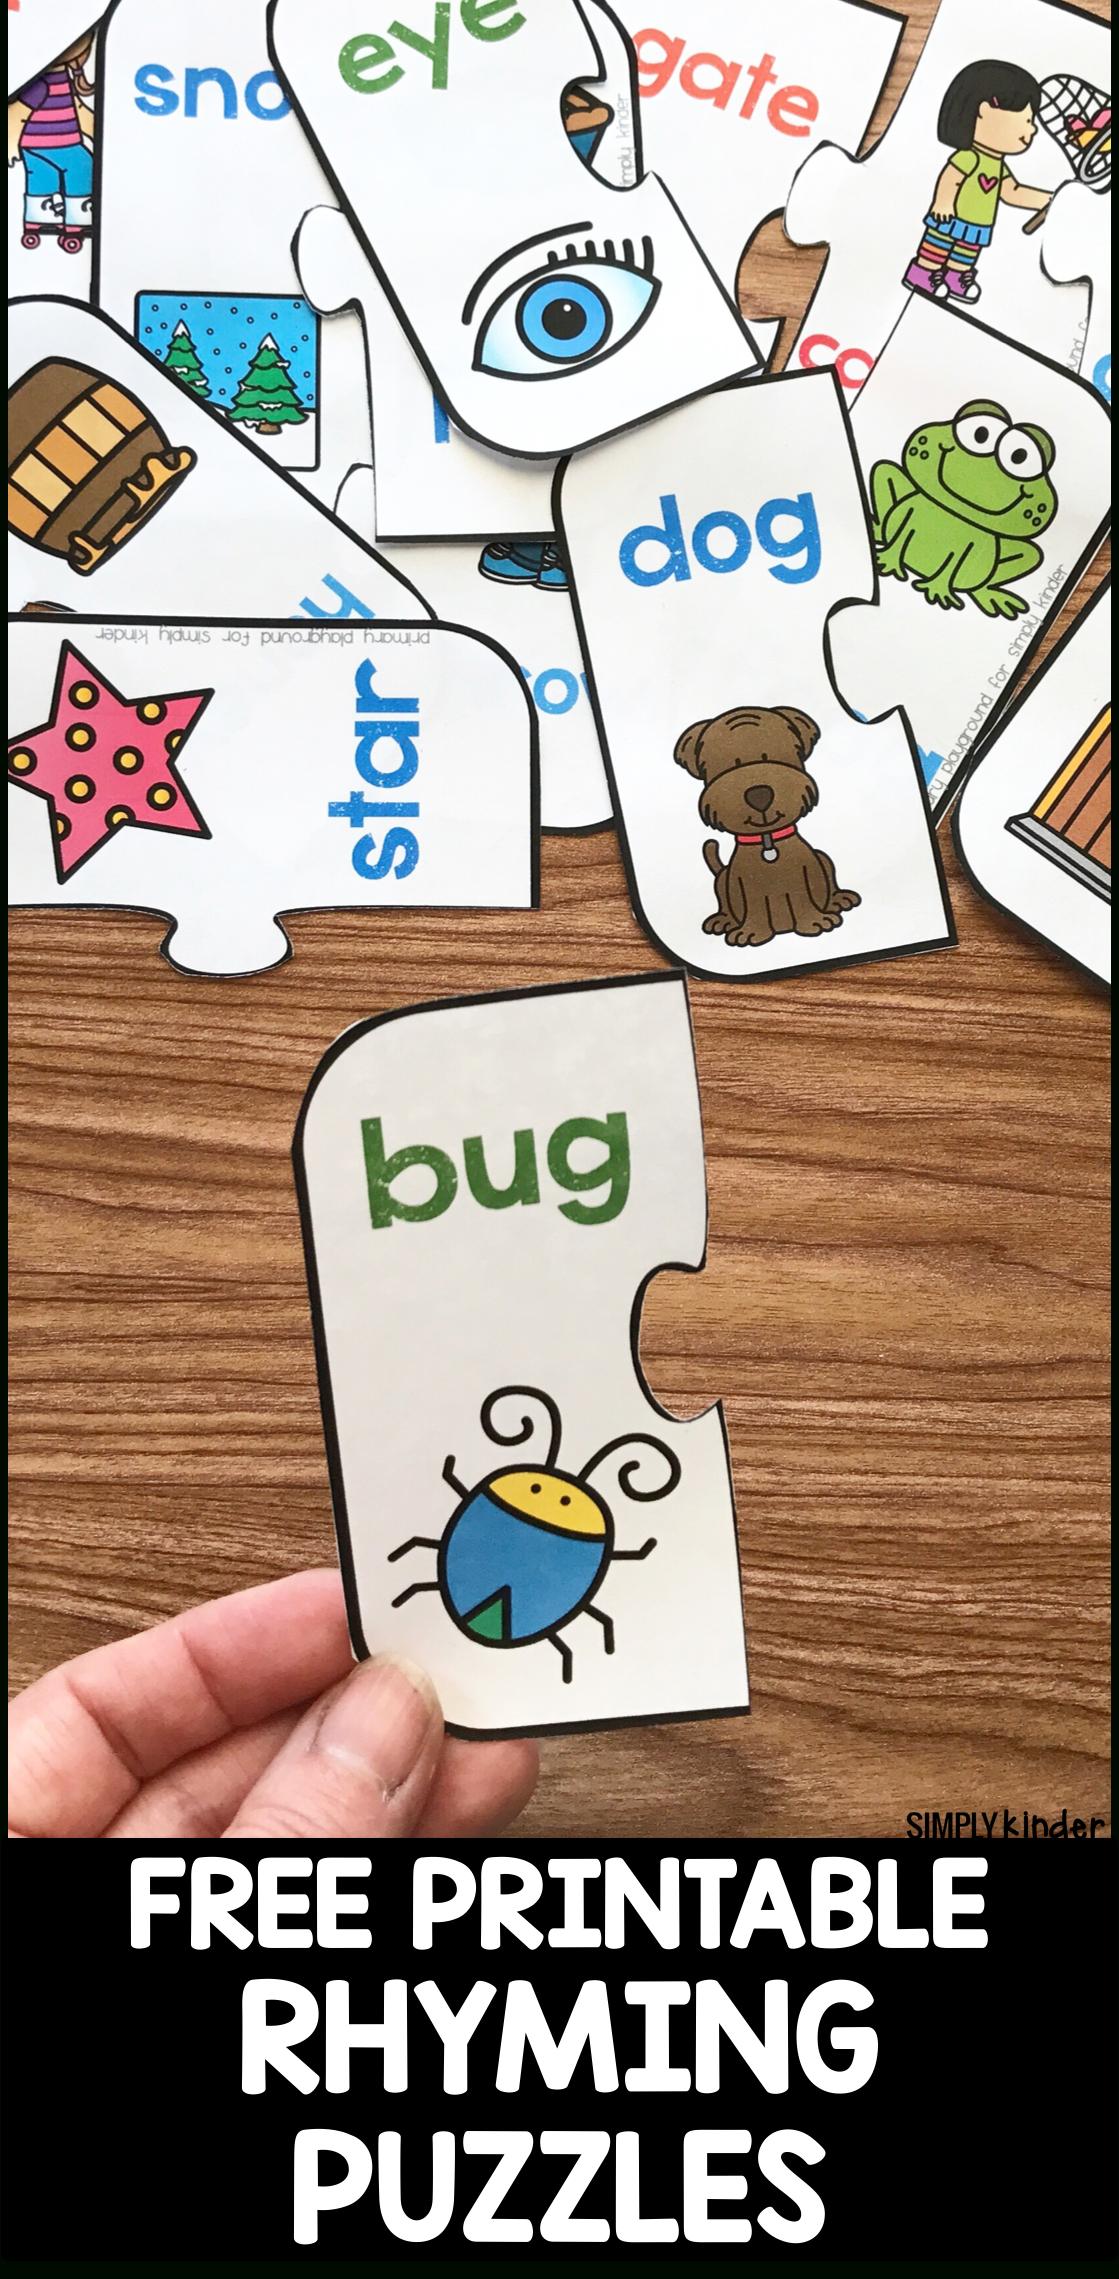 Free Printable Rhyming Puzzles - Simply Kinder - Printable Puzzles Preschool